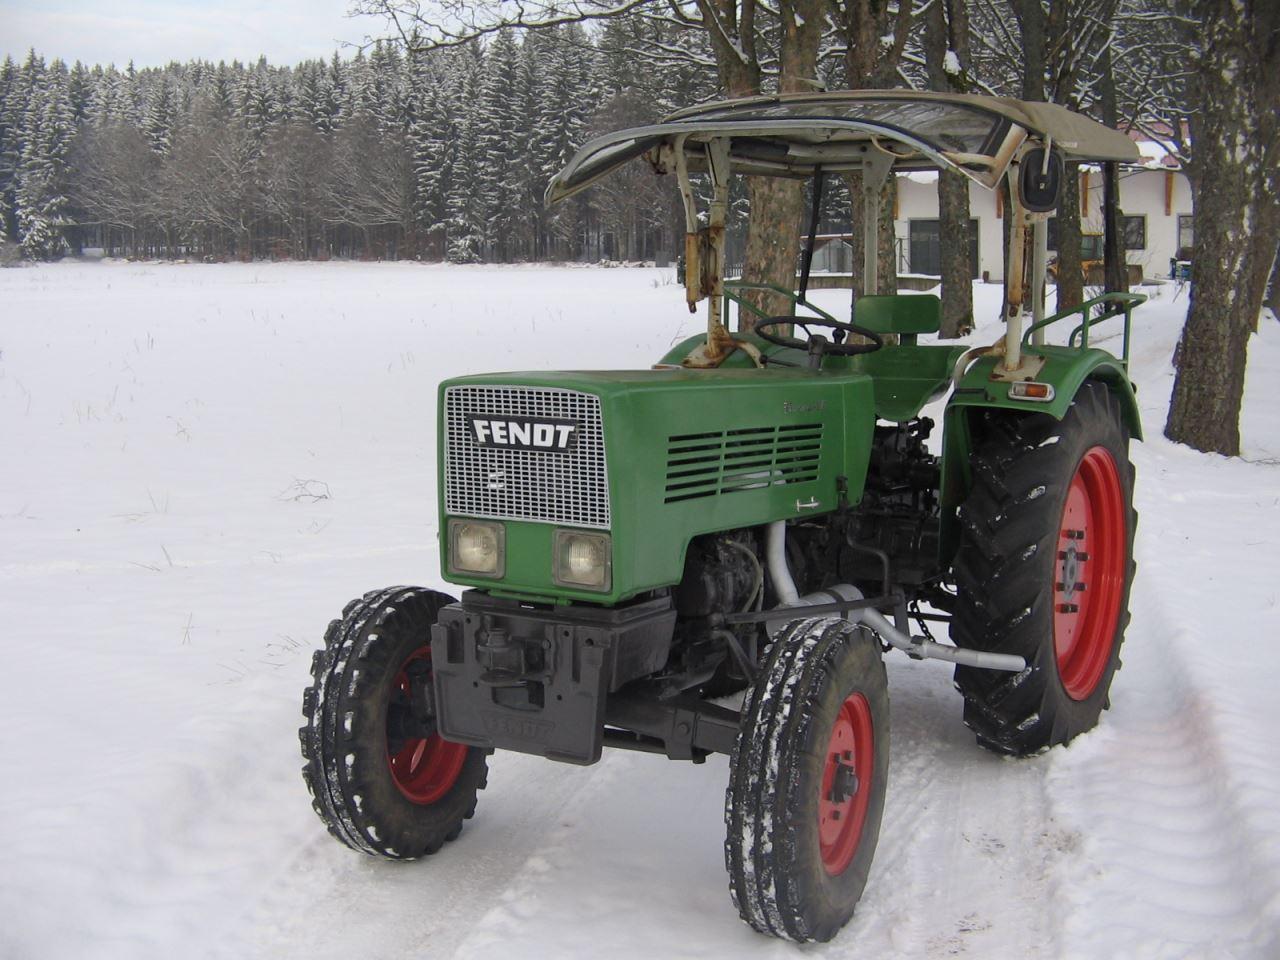 Indortec 2e Preis : fendt farmer 2 e maschinenhandel nebl ~ Frokenaadalensverden.com Haus und Dekorationen